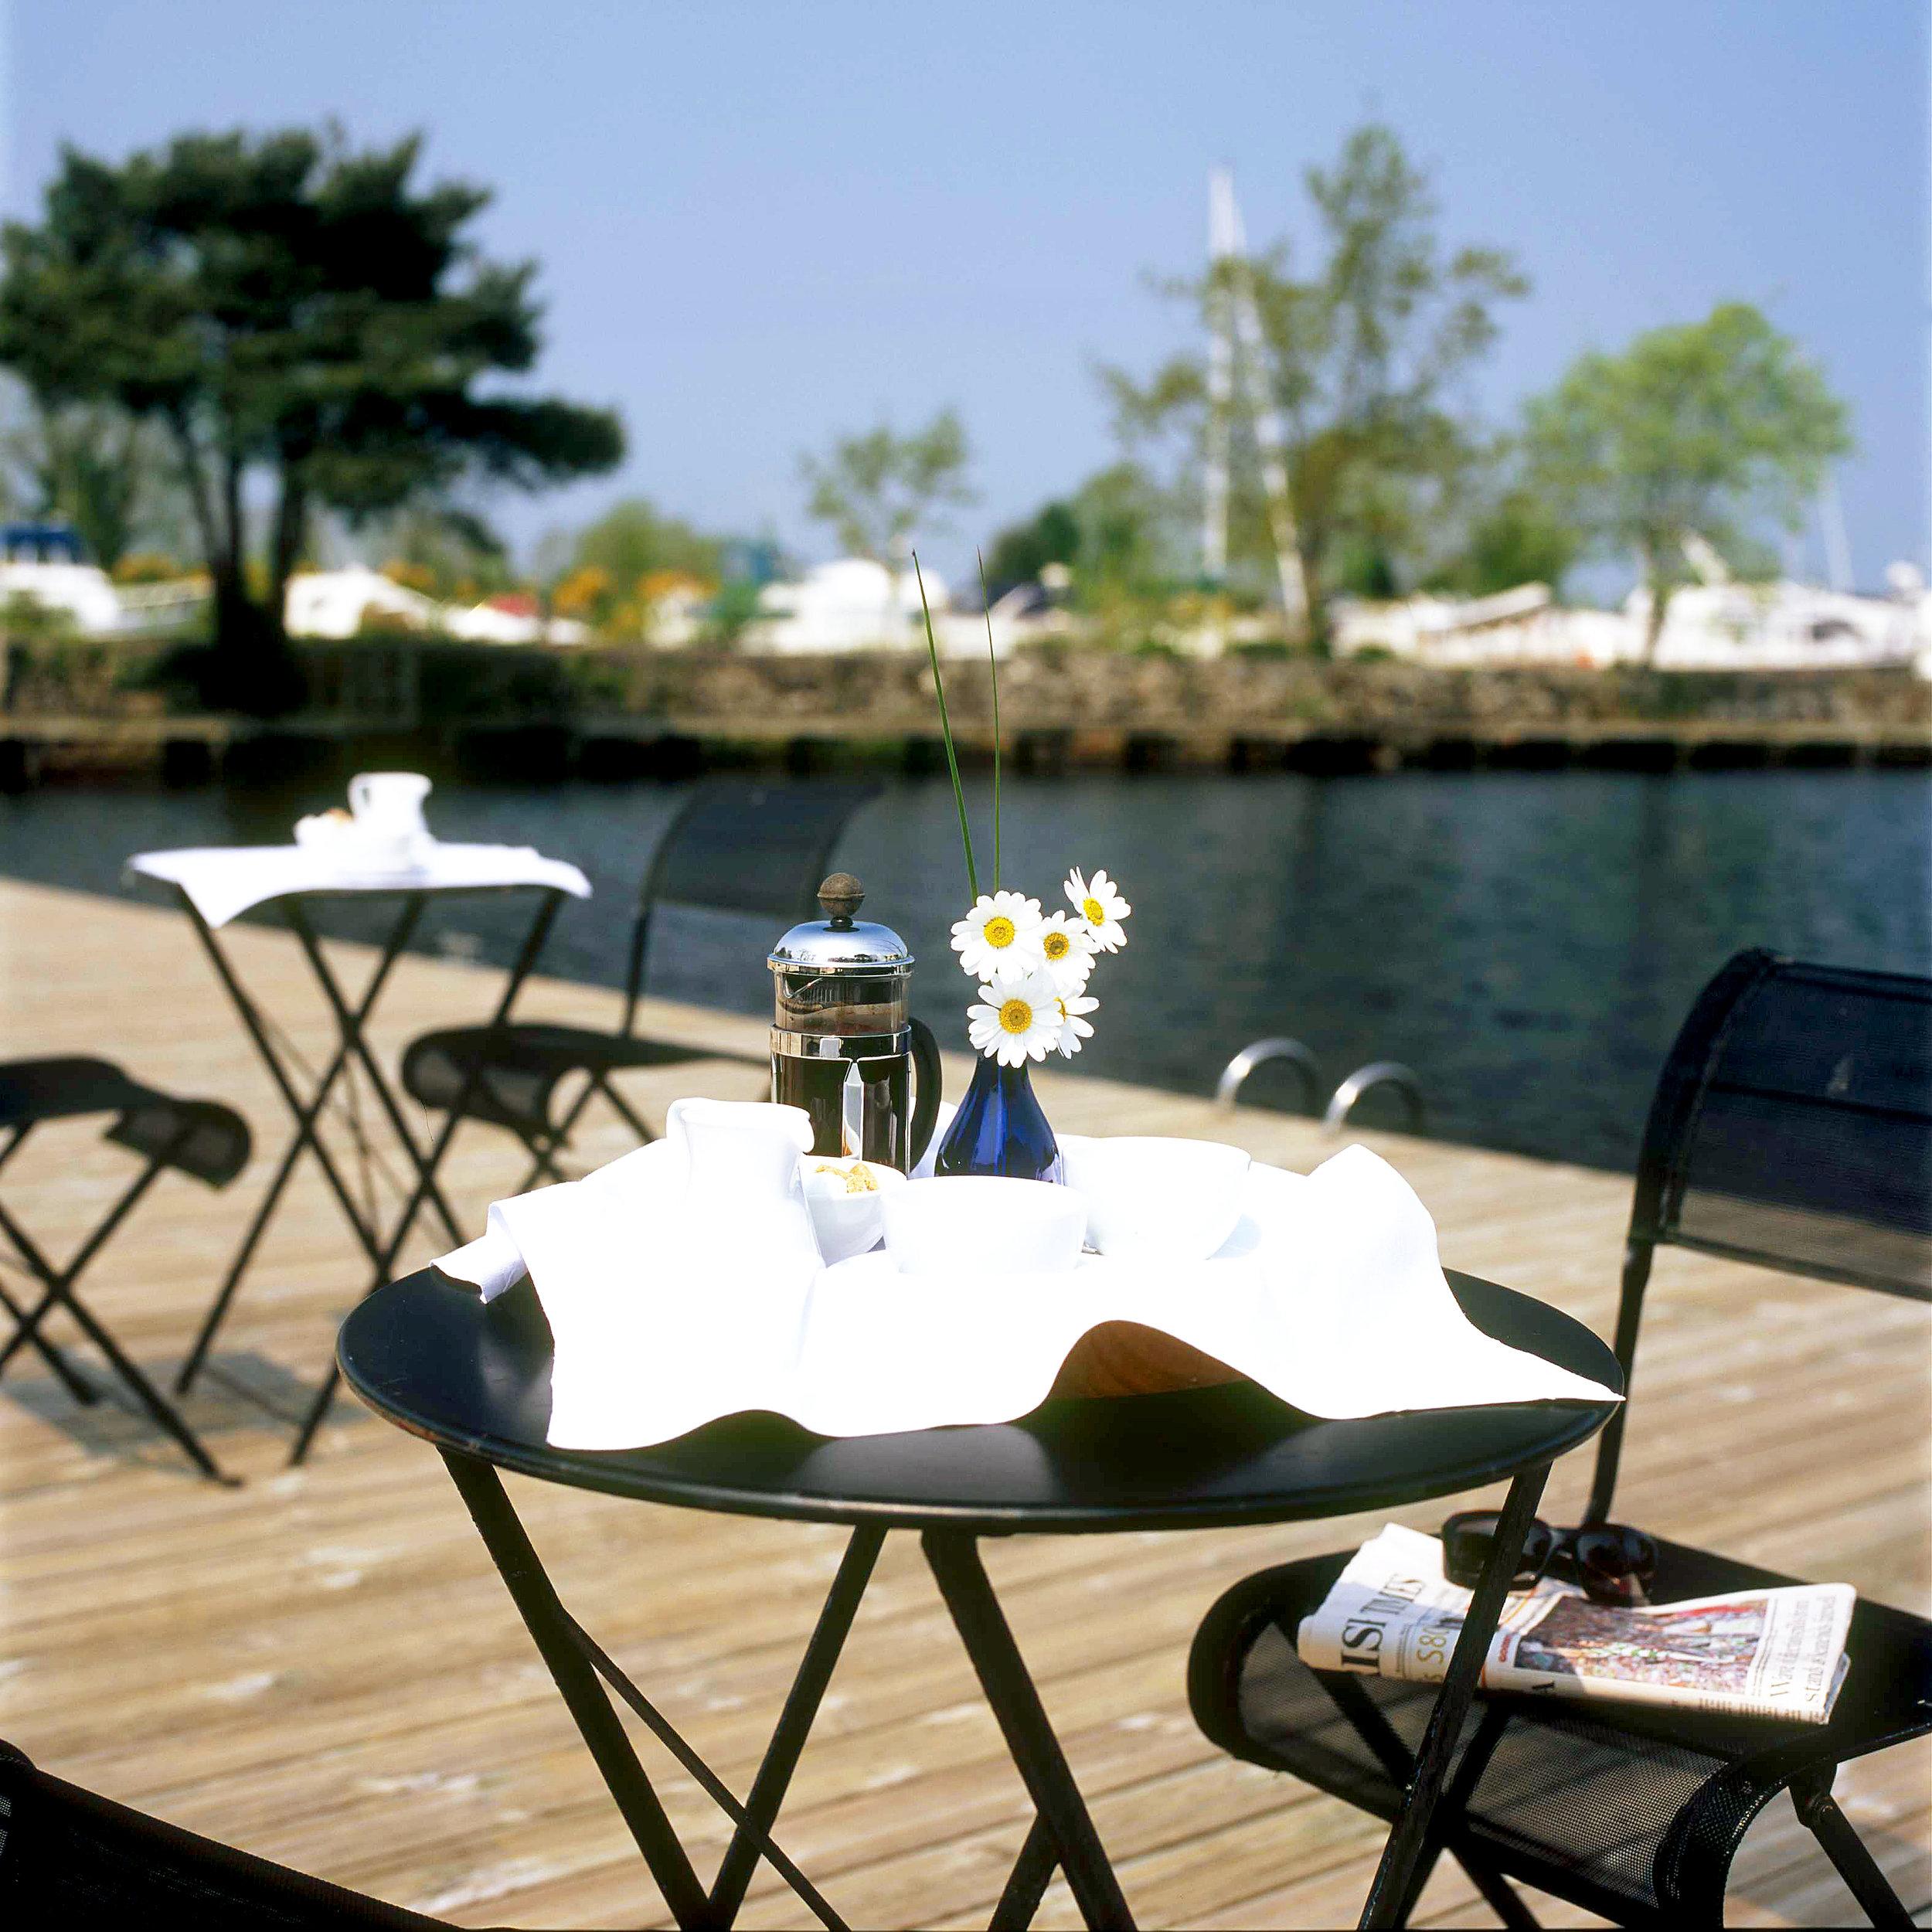 Breakfast on Deck with Daisies HR.jpg